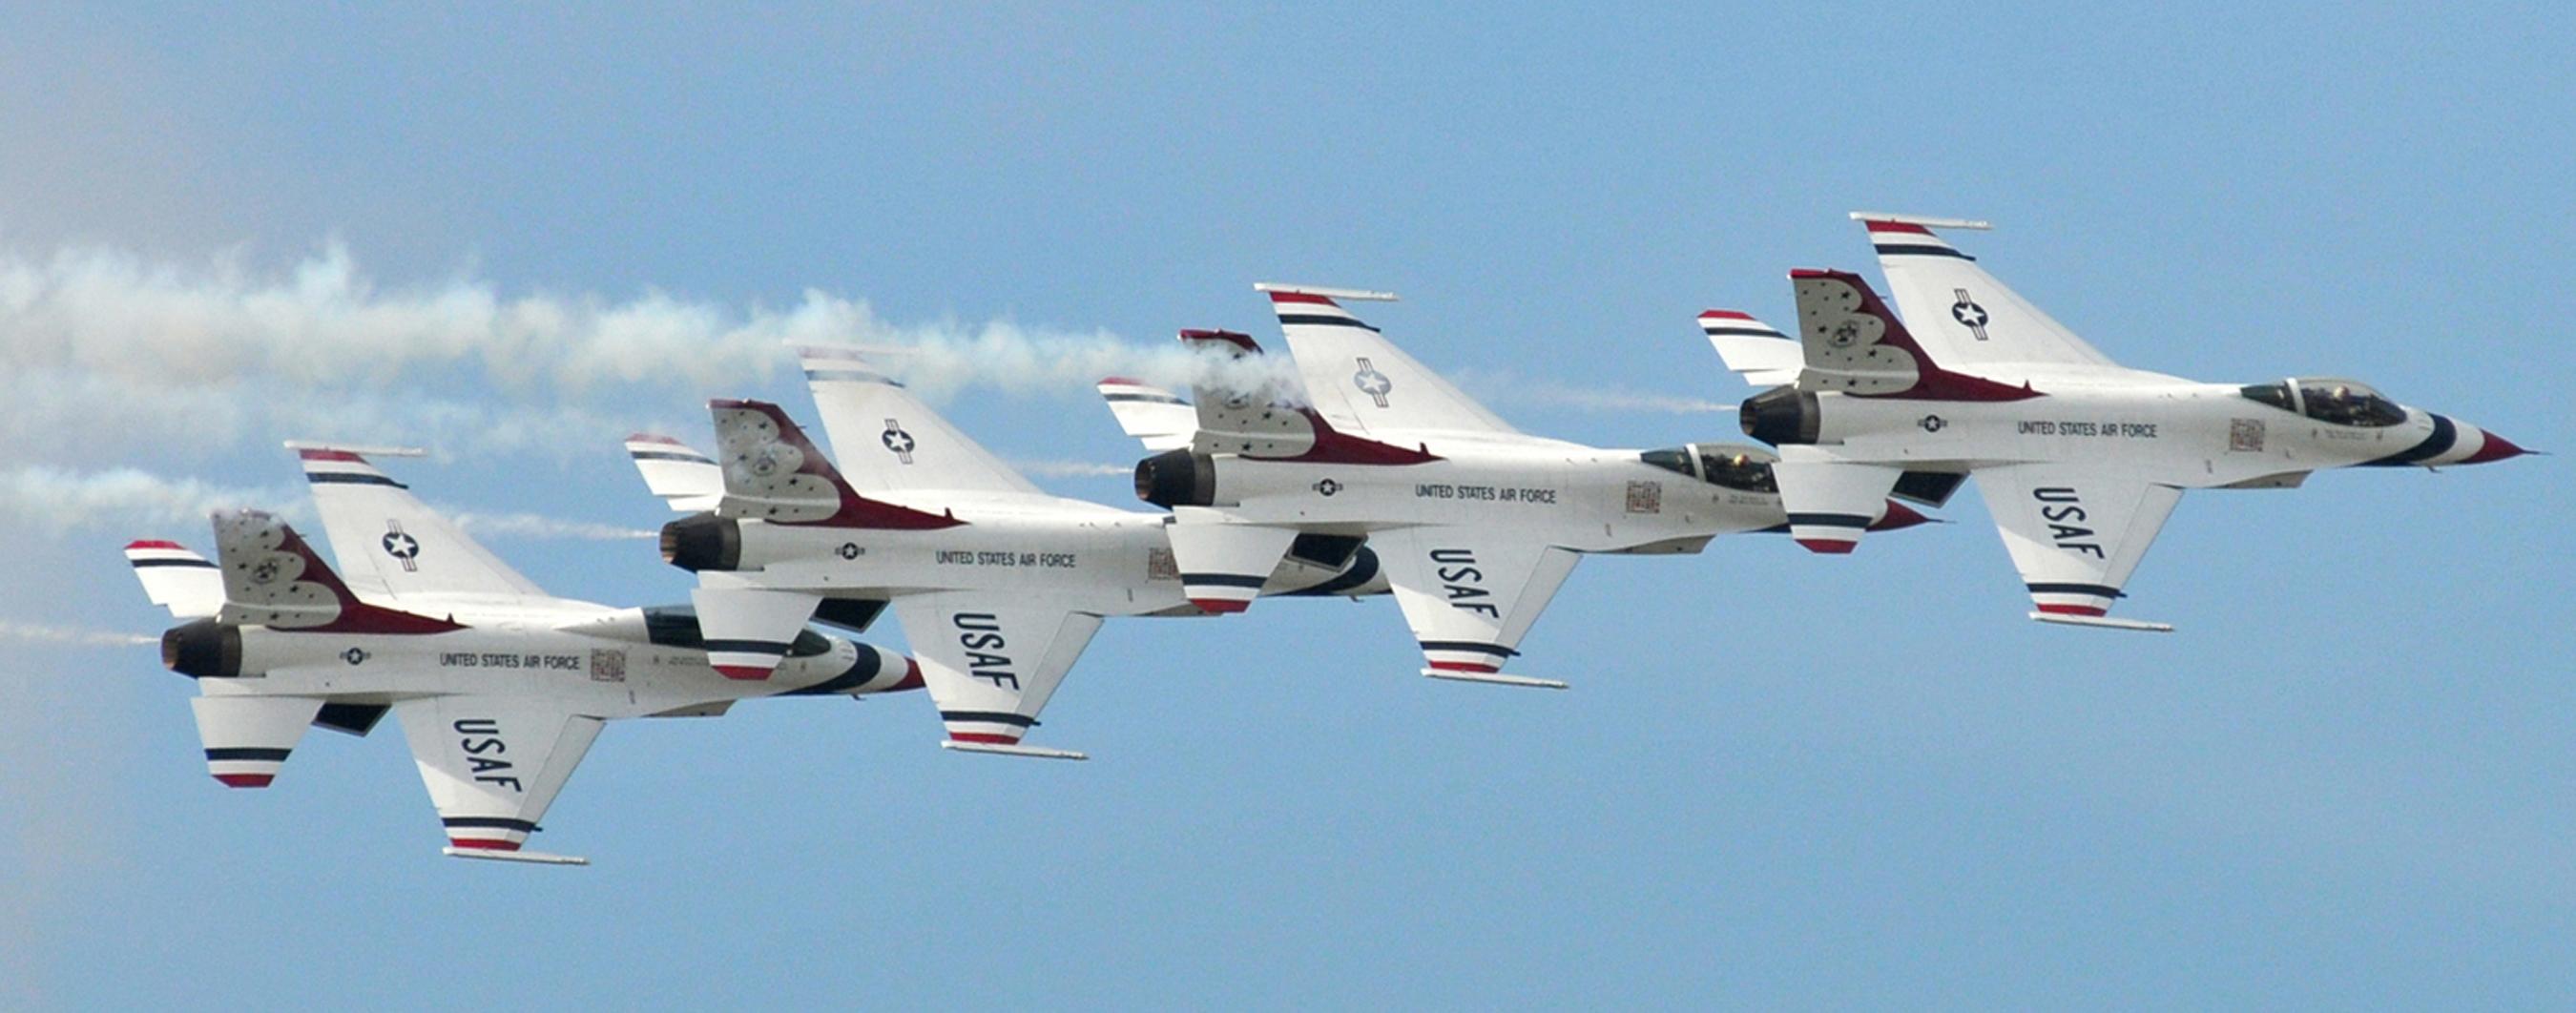 File Usaf Thunderbirds 090407 F 4827b 503 Jpg Wikimedia